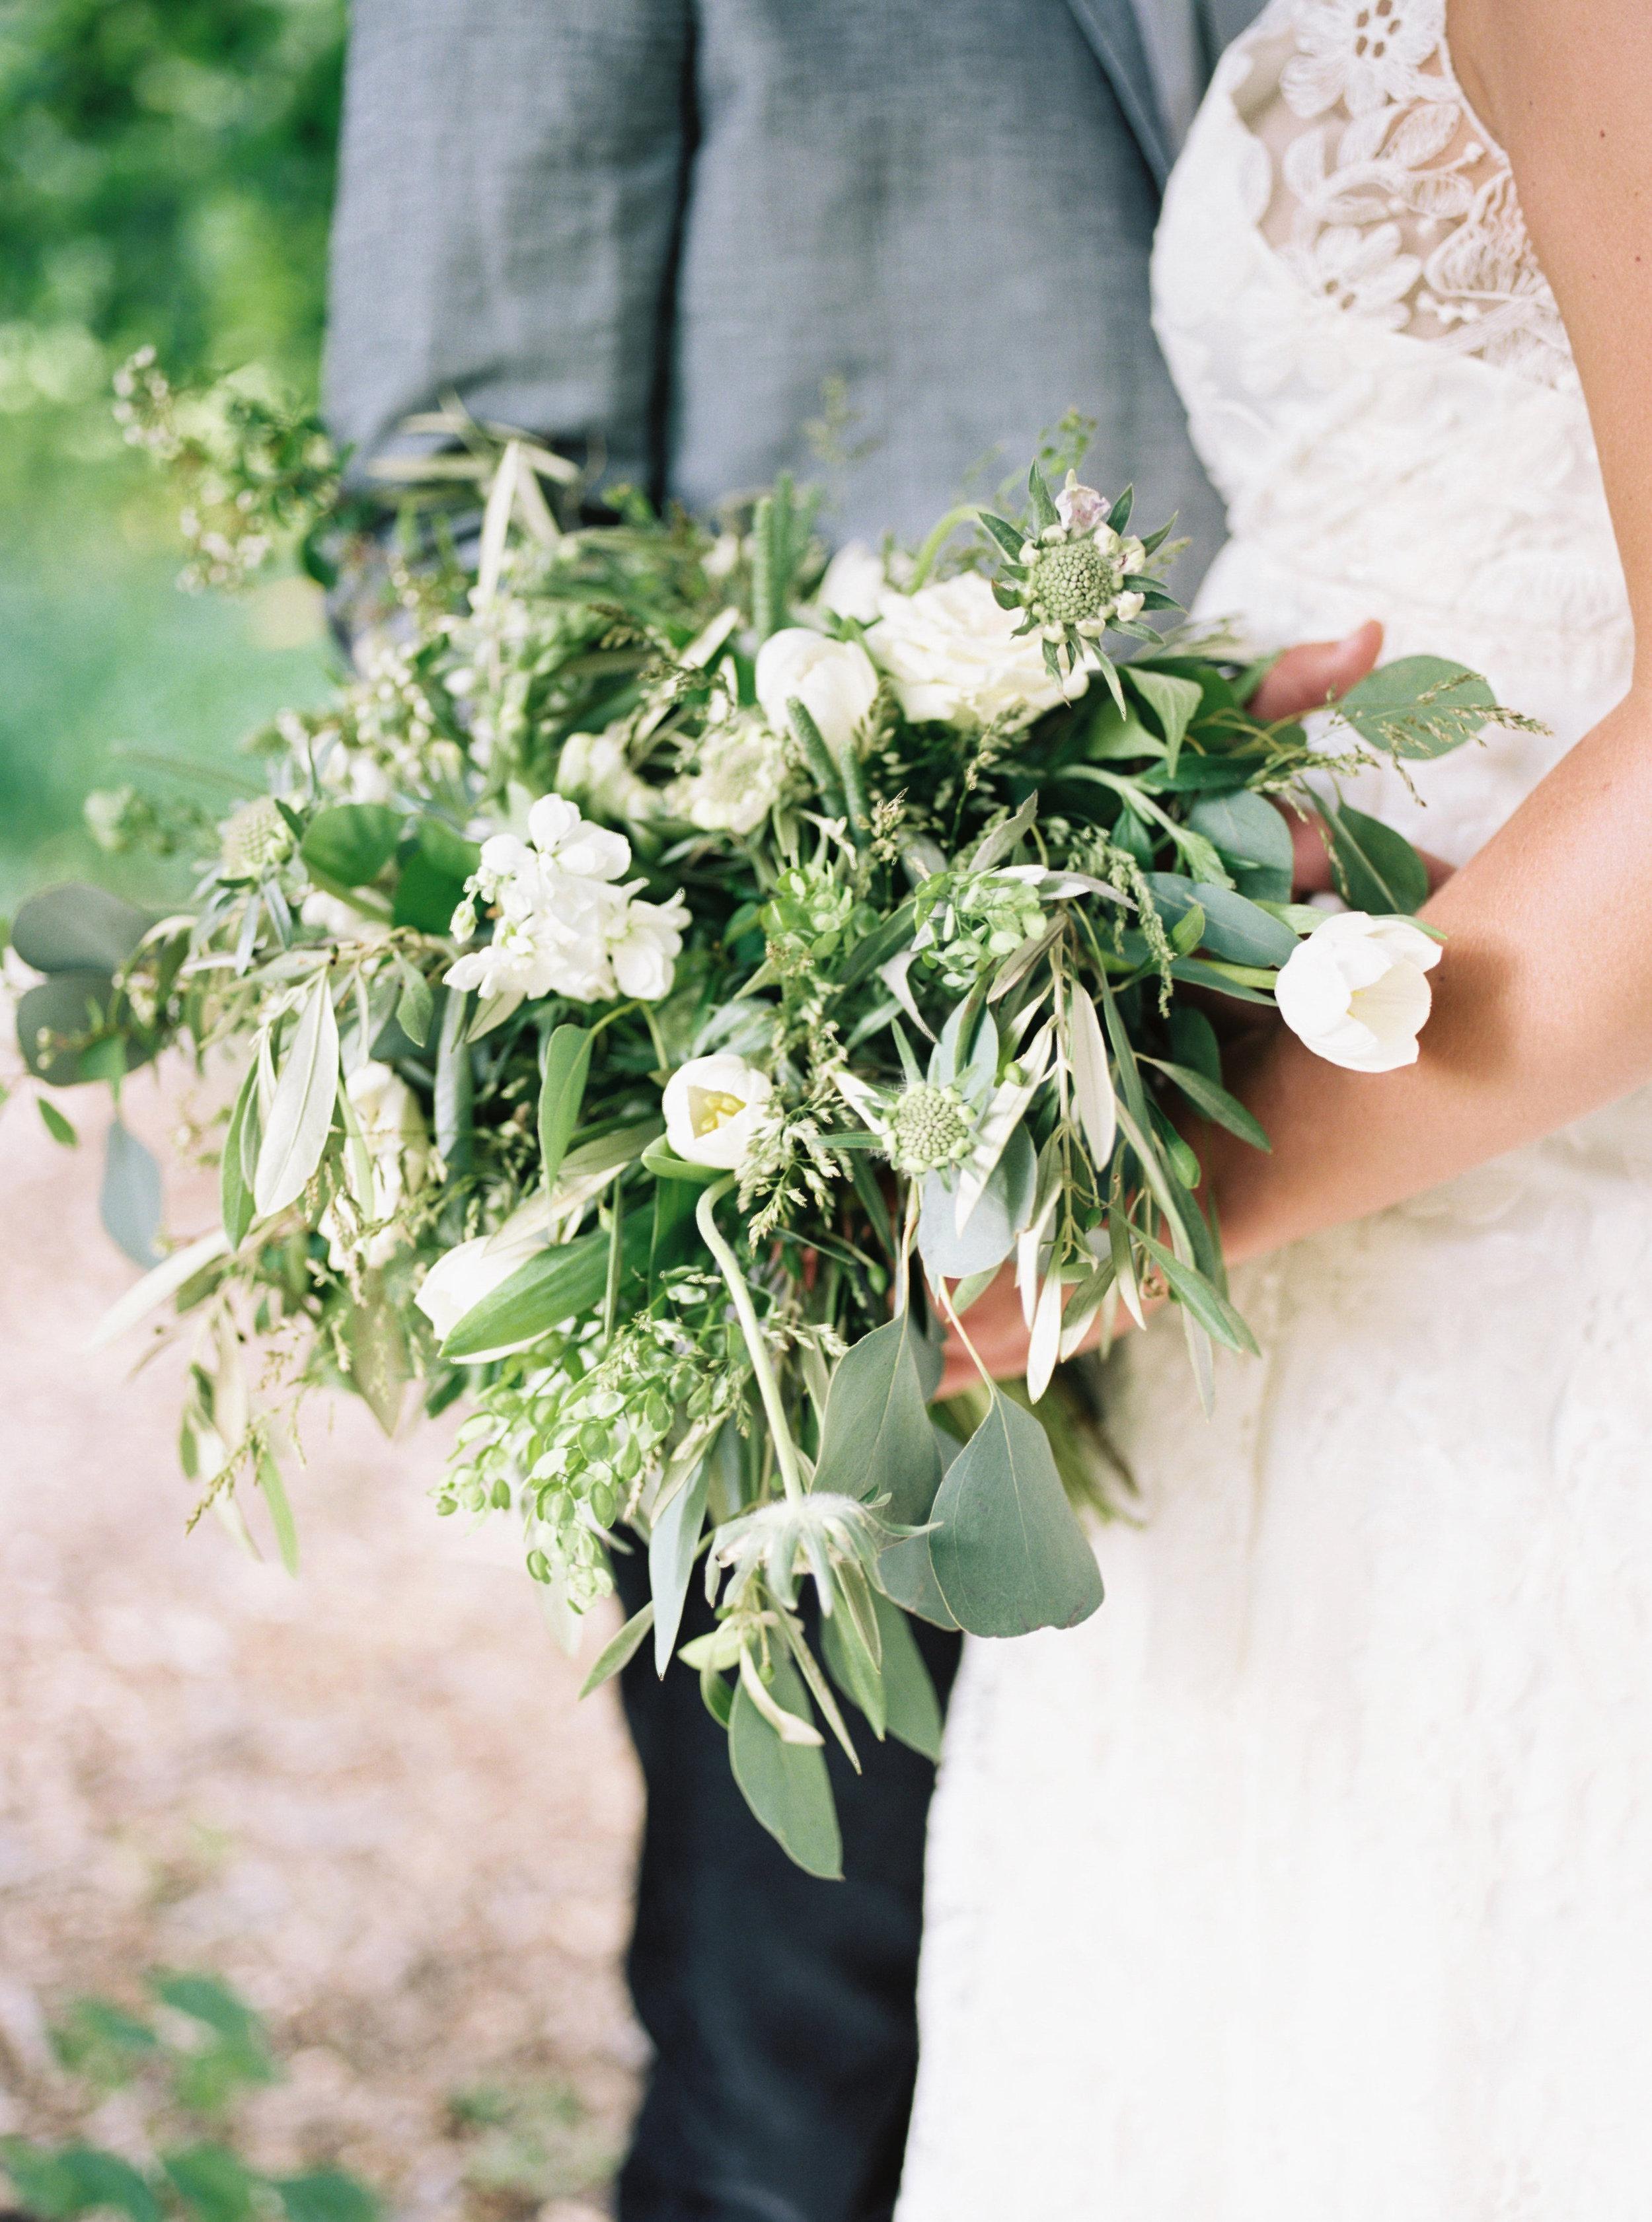 greenhouse-wedding-inspiration-by-laurelyn-savannah-photography-126.jpg